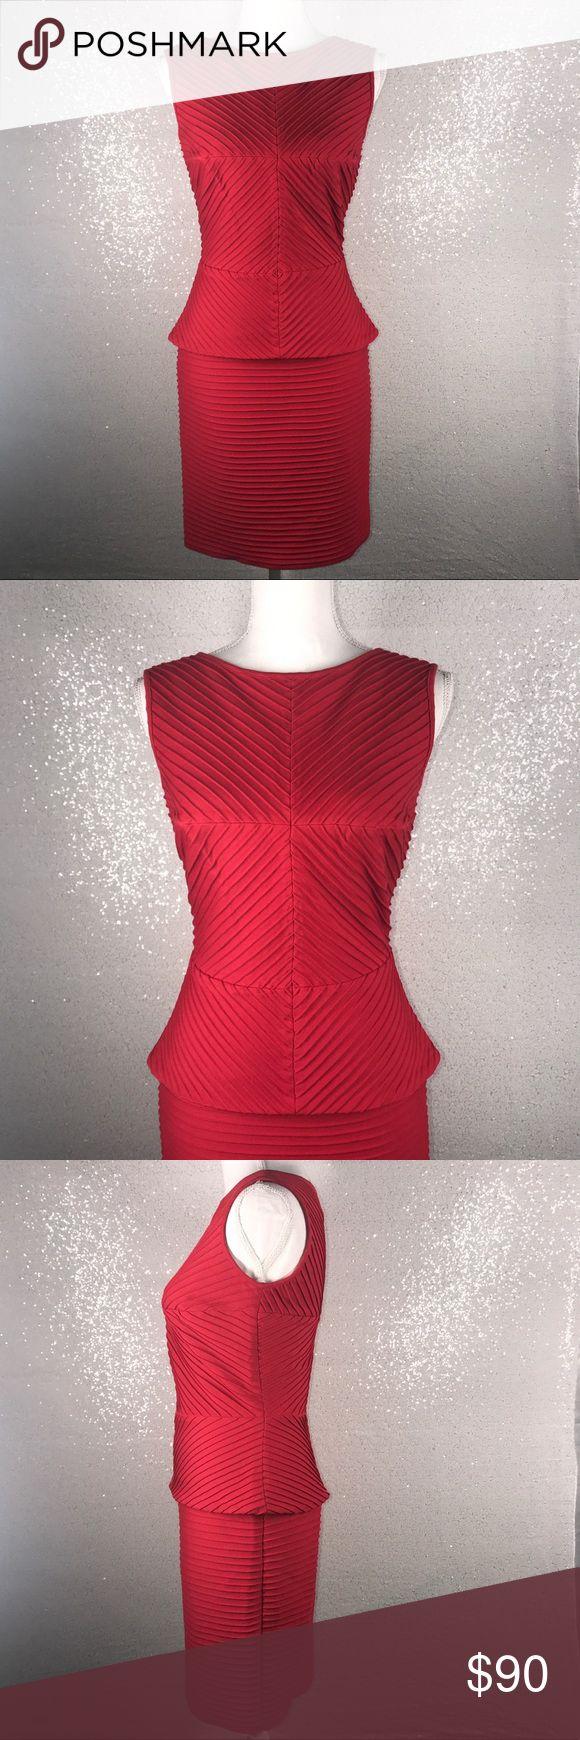 "[Tadashi shoji] Red dress Tadashi Shoji Women's XS  sleeveless  Red Pleat peplum dress  Great condition  Measurements laying flat:  Armpit to armpit: 16.5"" Waist: 14"" (28"" waist)  Length: 33"" Tadashi Shoji Dresses"